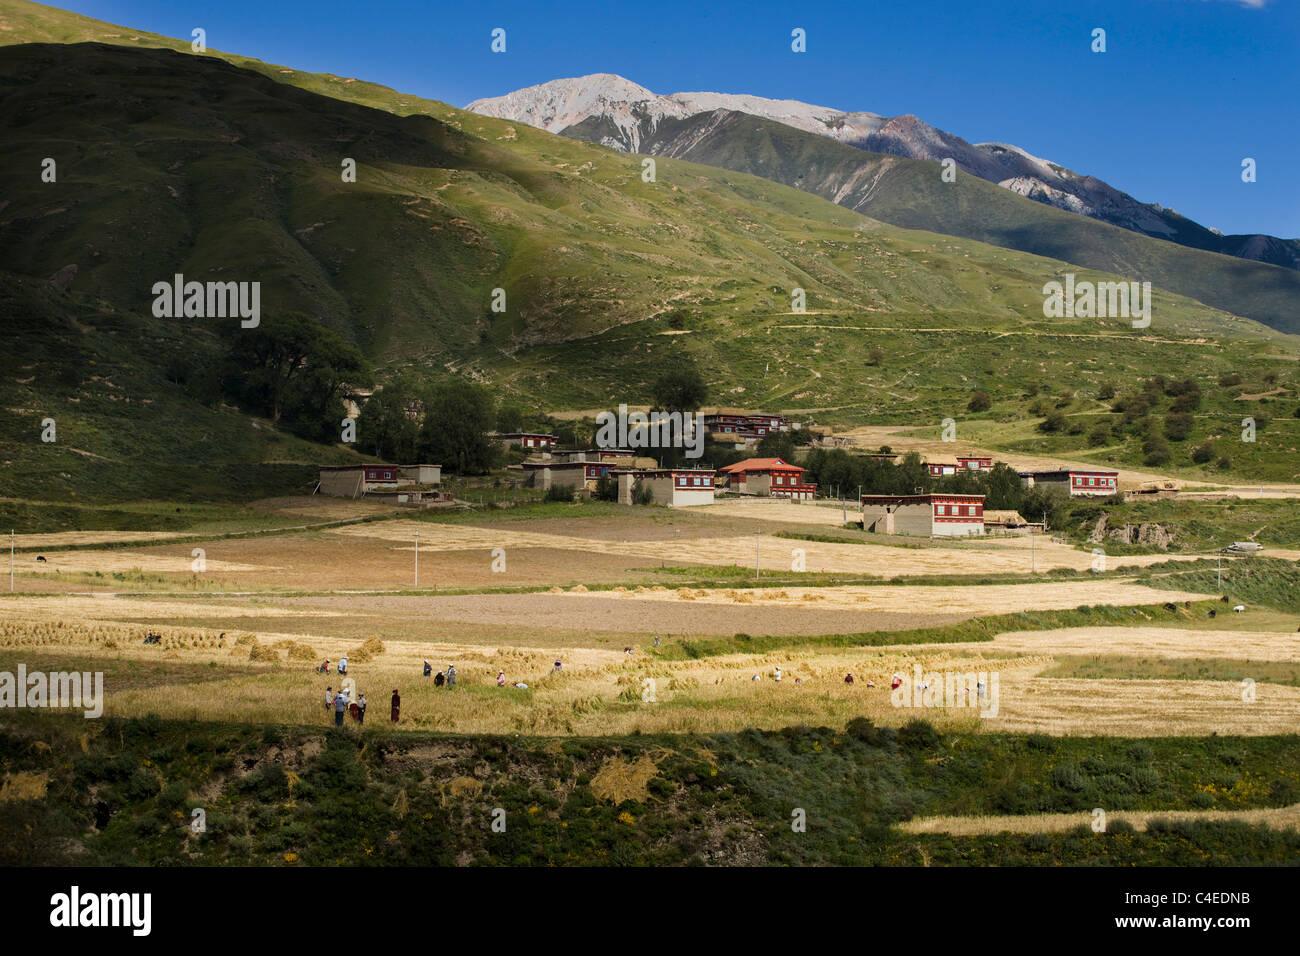 Harvest, near Ganzi, Sichuan, China - Stock Image